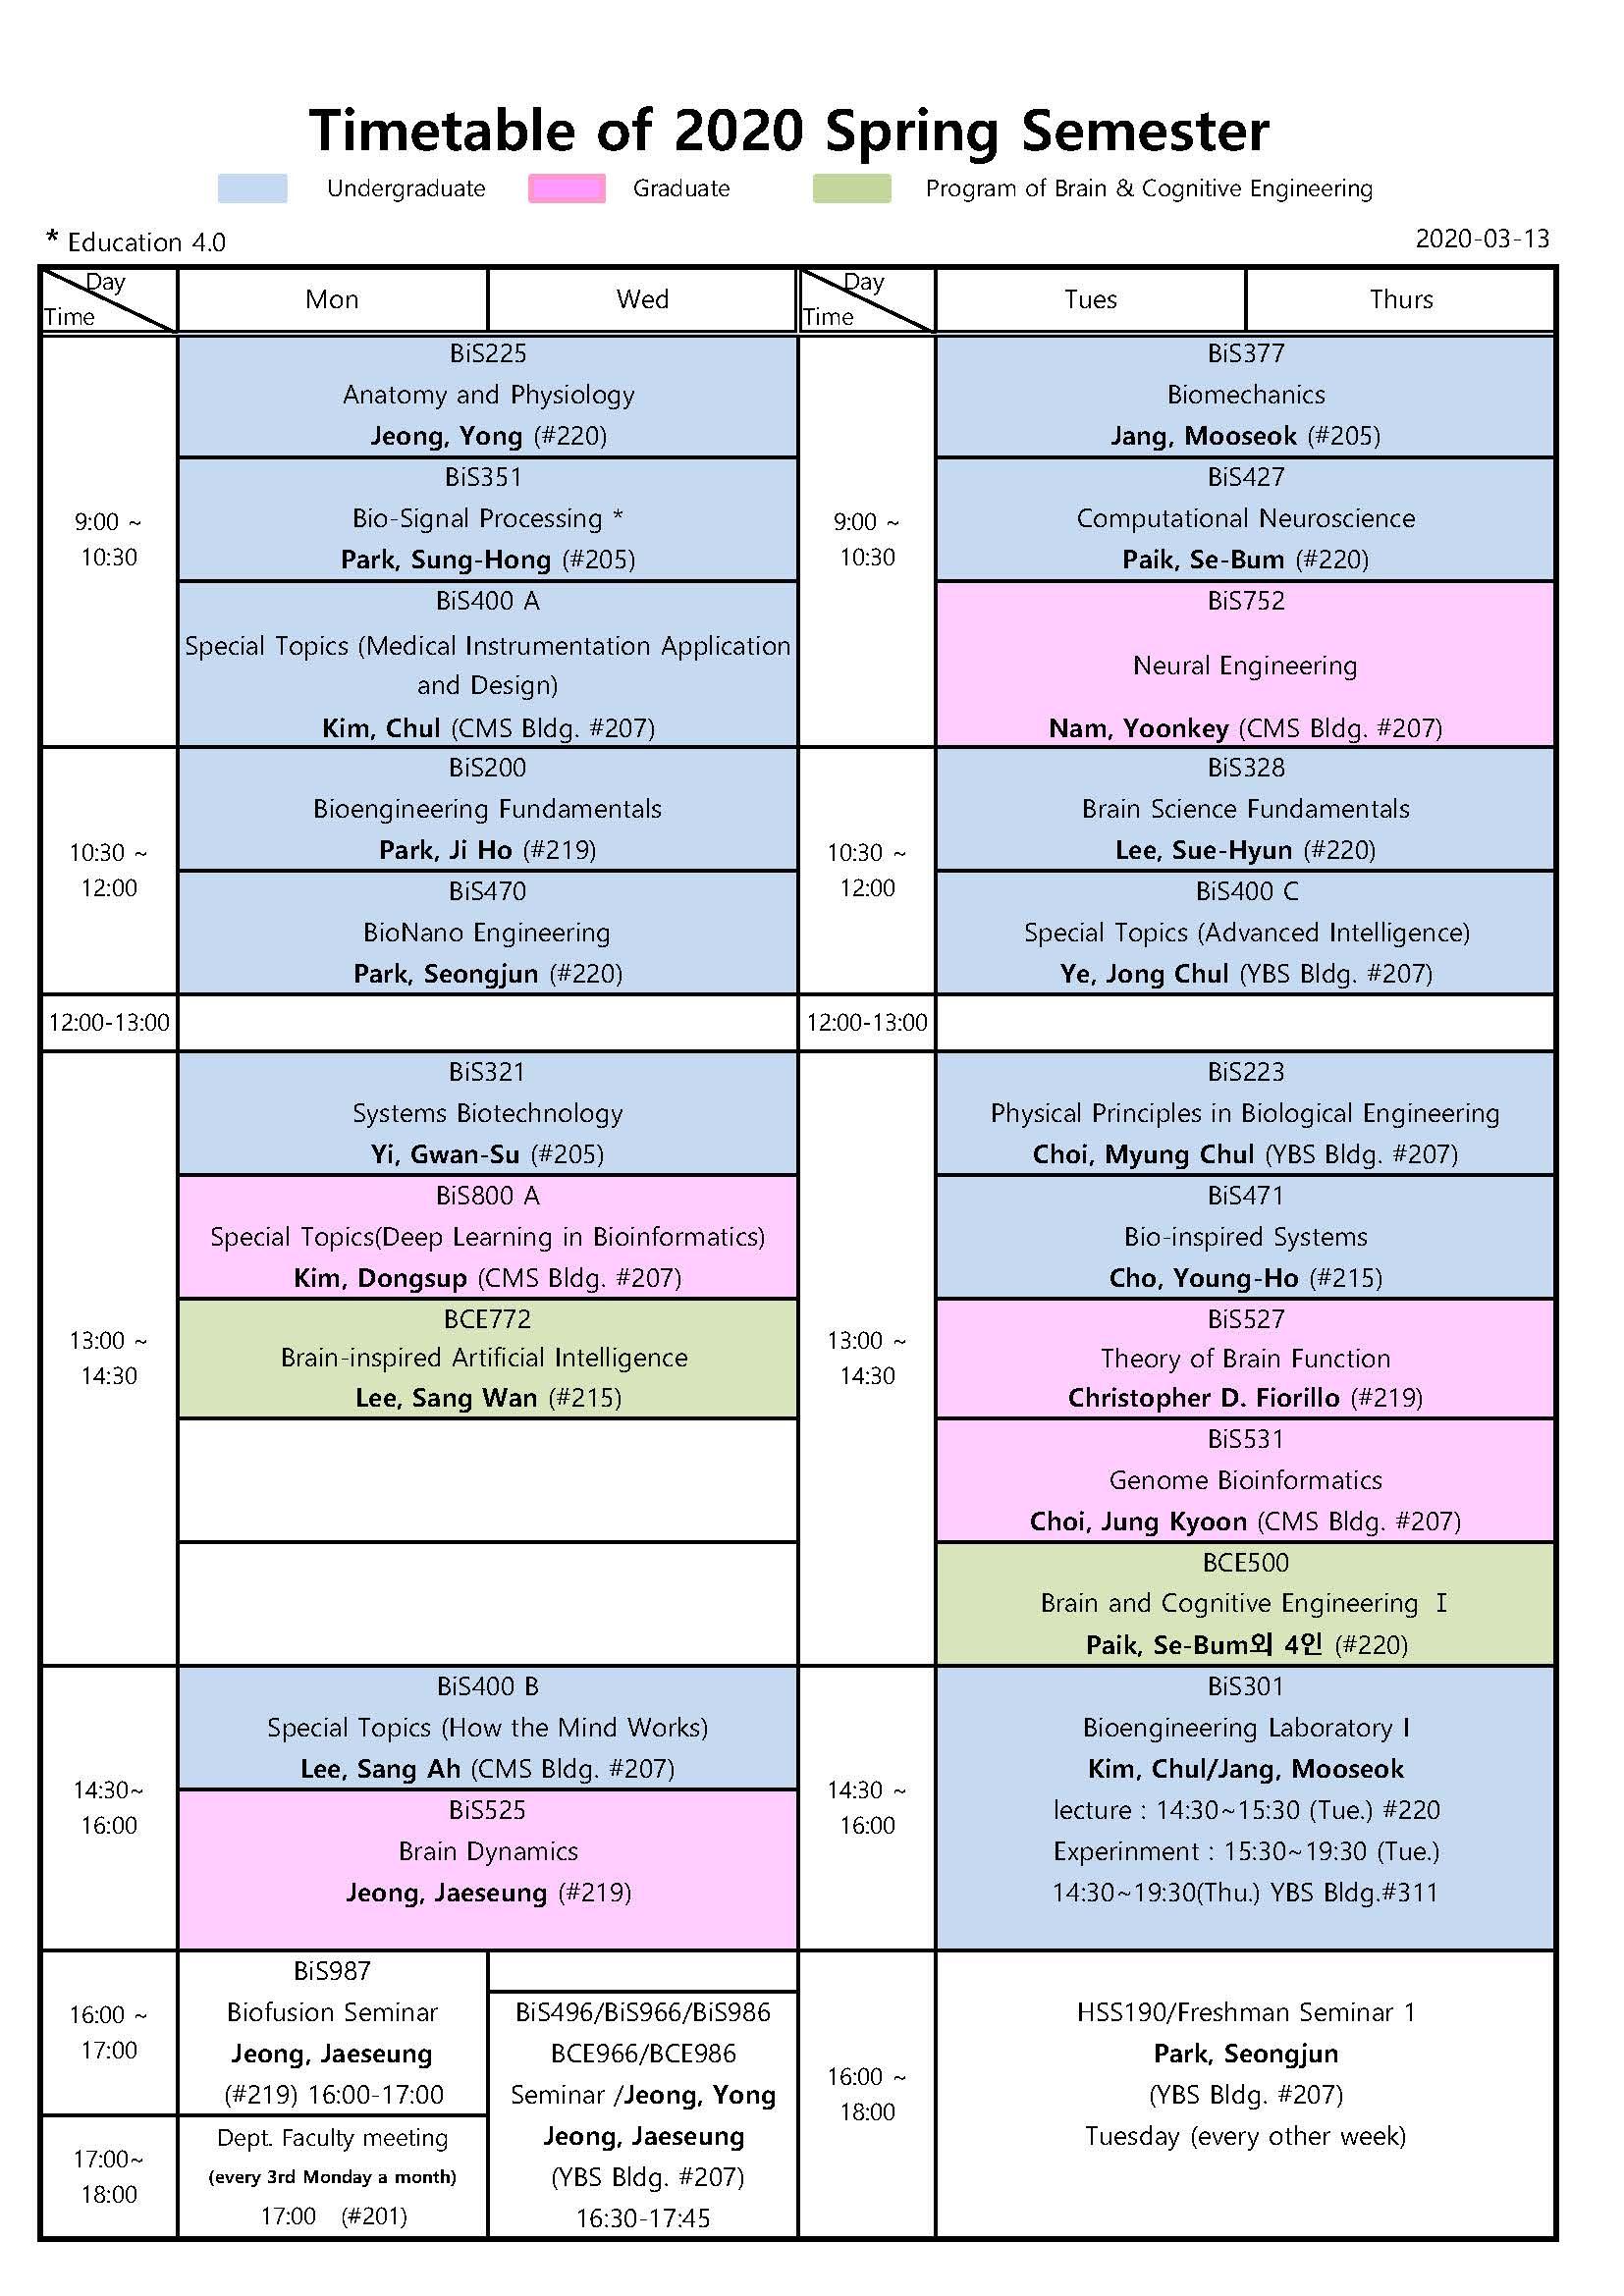 Timetable2020 Spring_0313.jpg